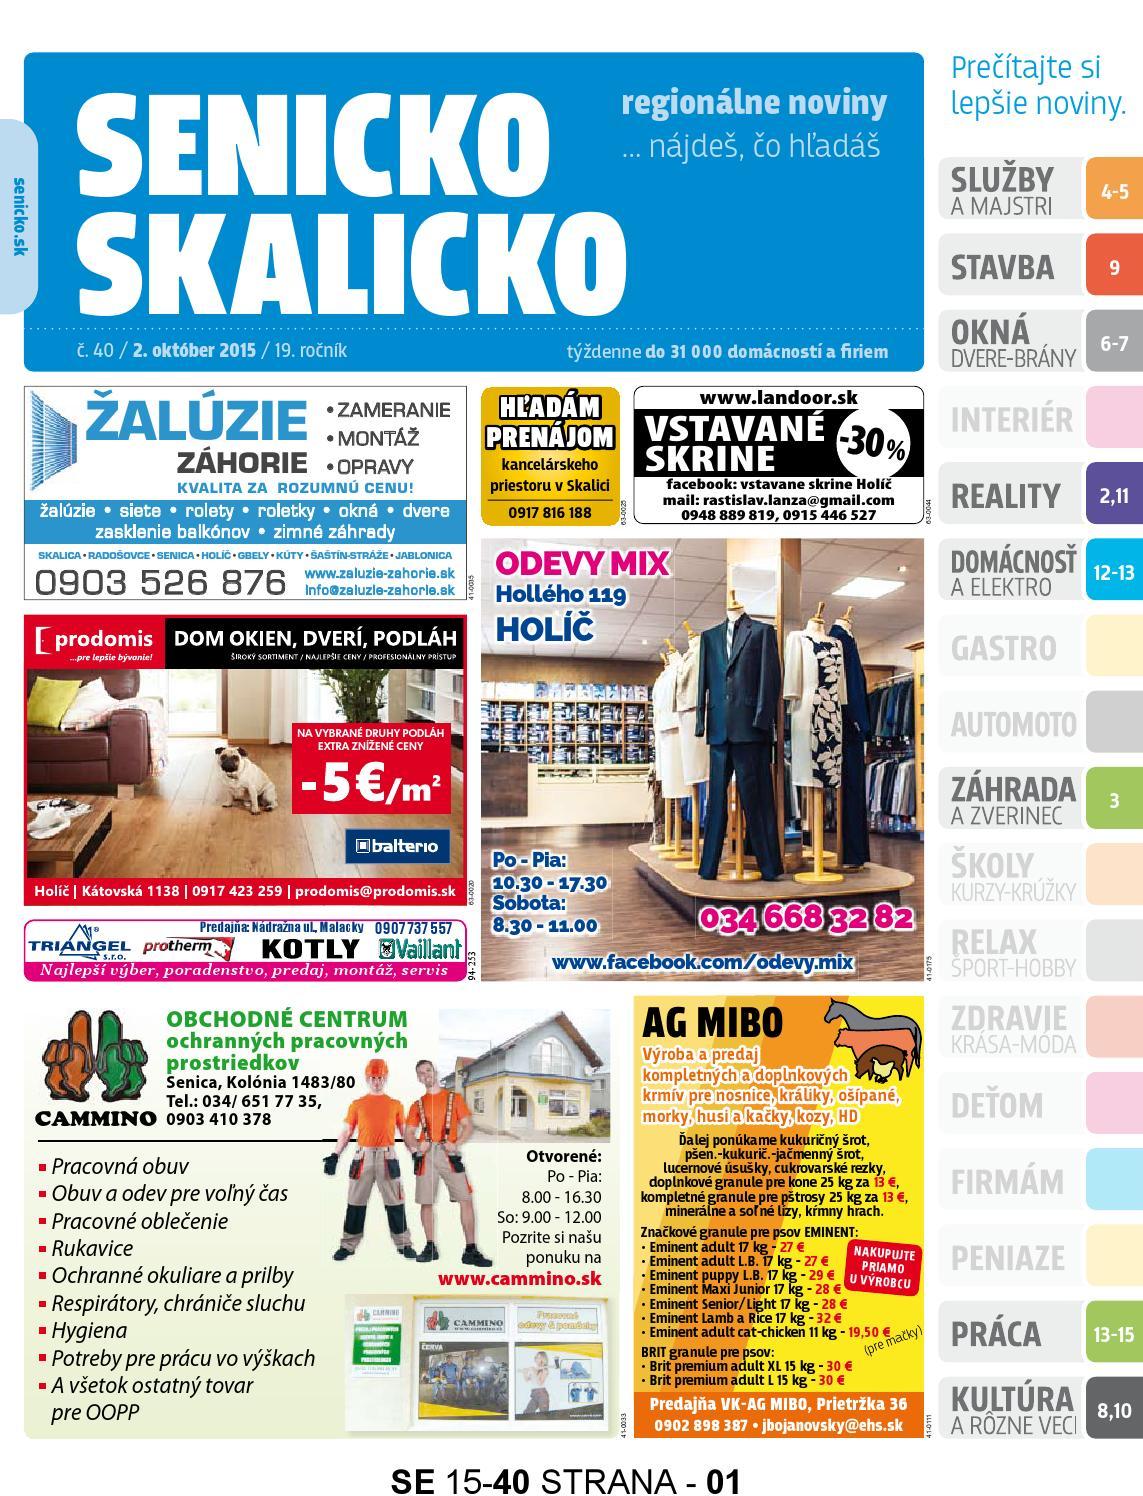 33d34fac7 Senicko-Skalicko 15-40 by skalicko skalicko - issuu